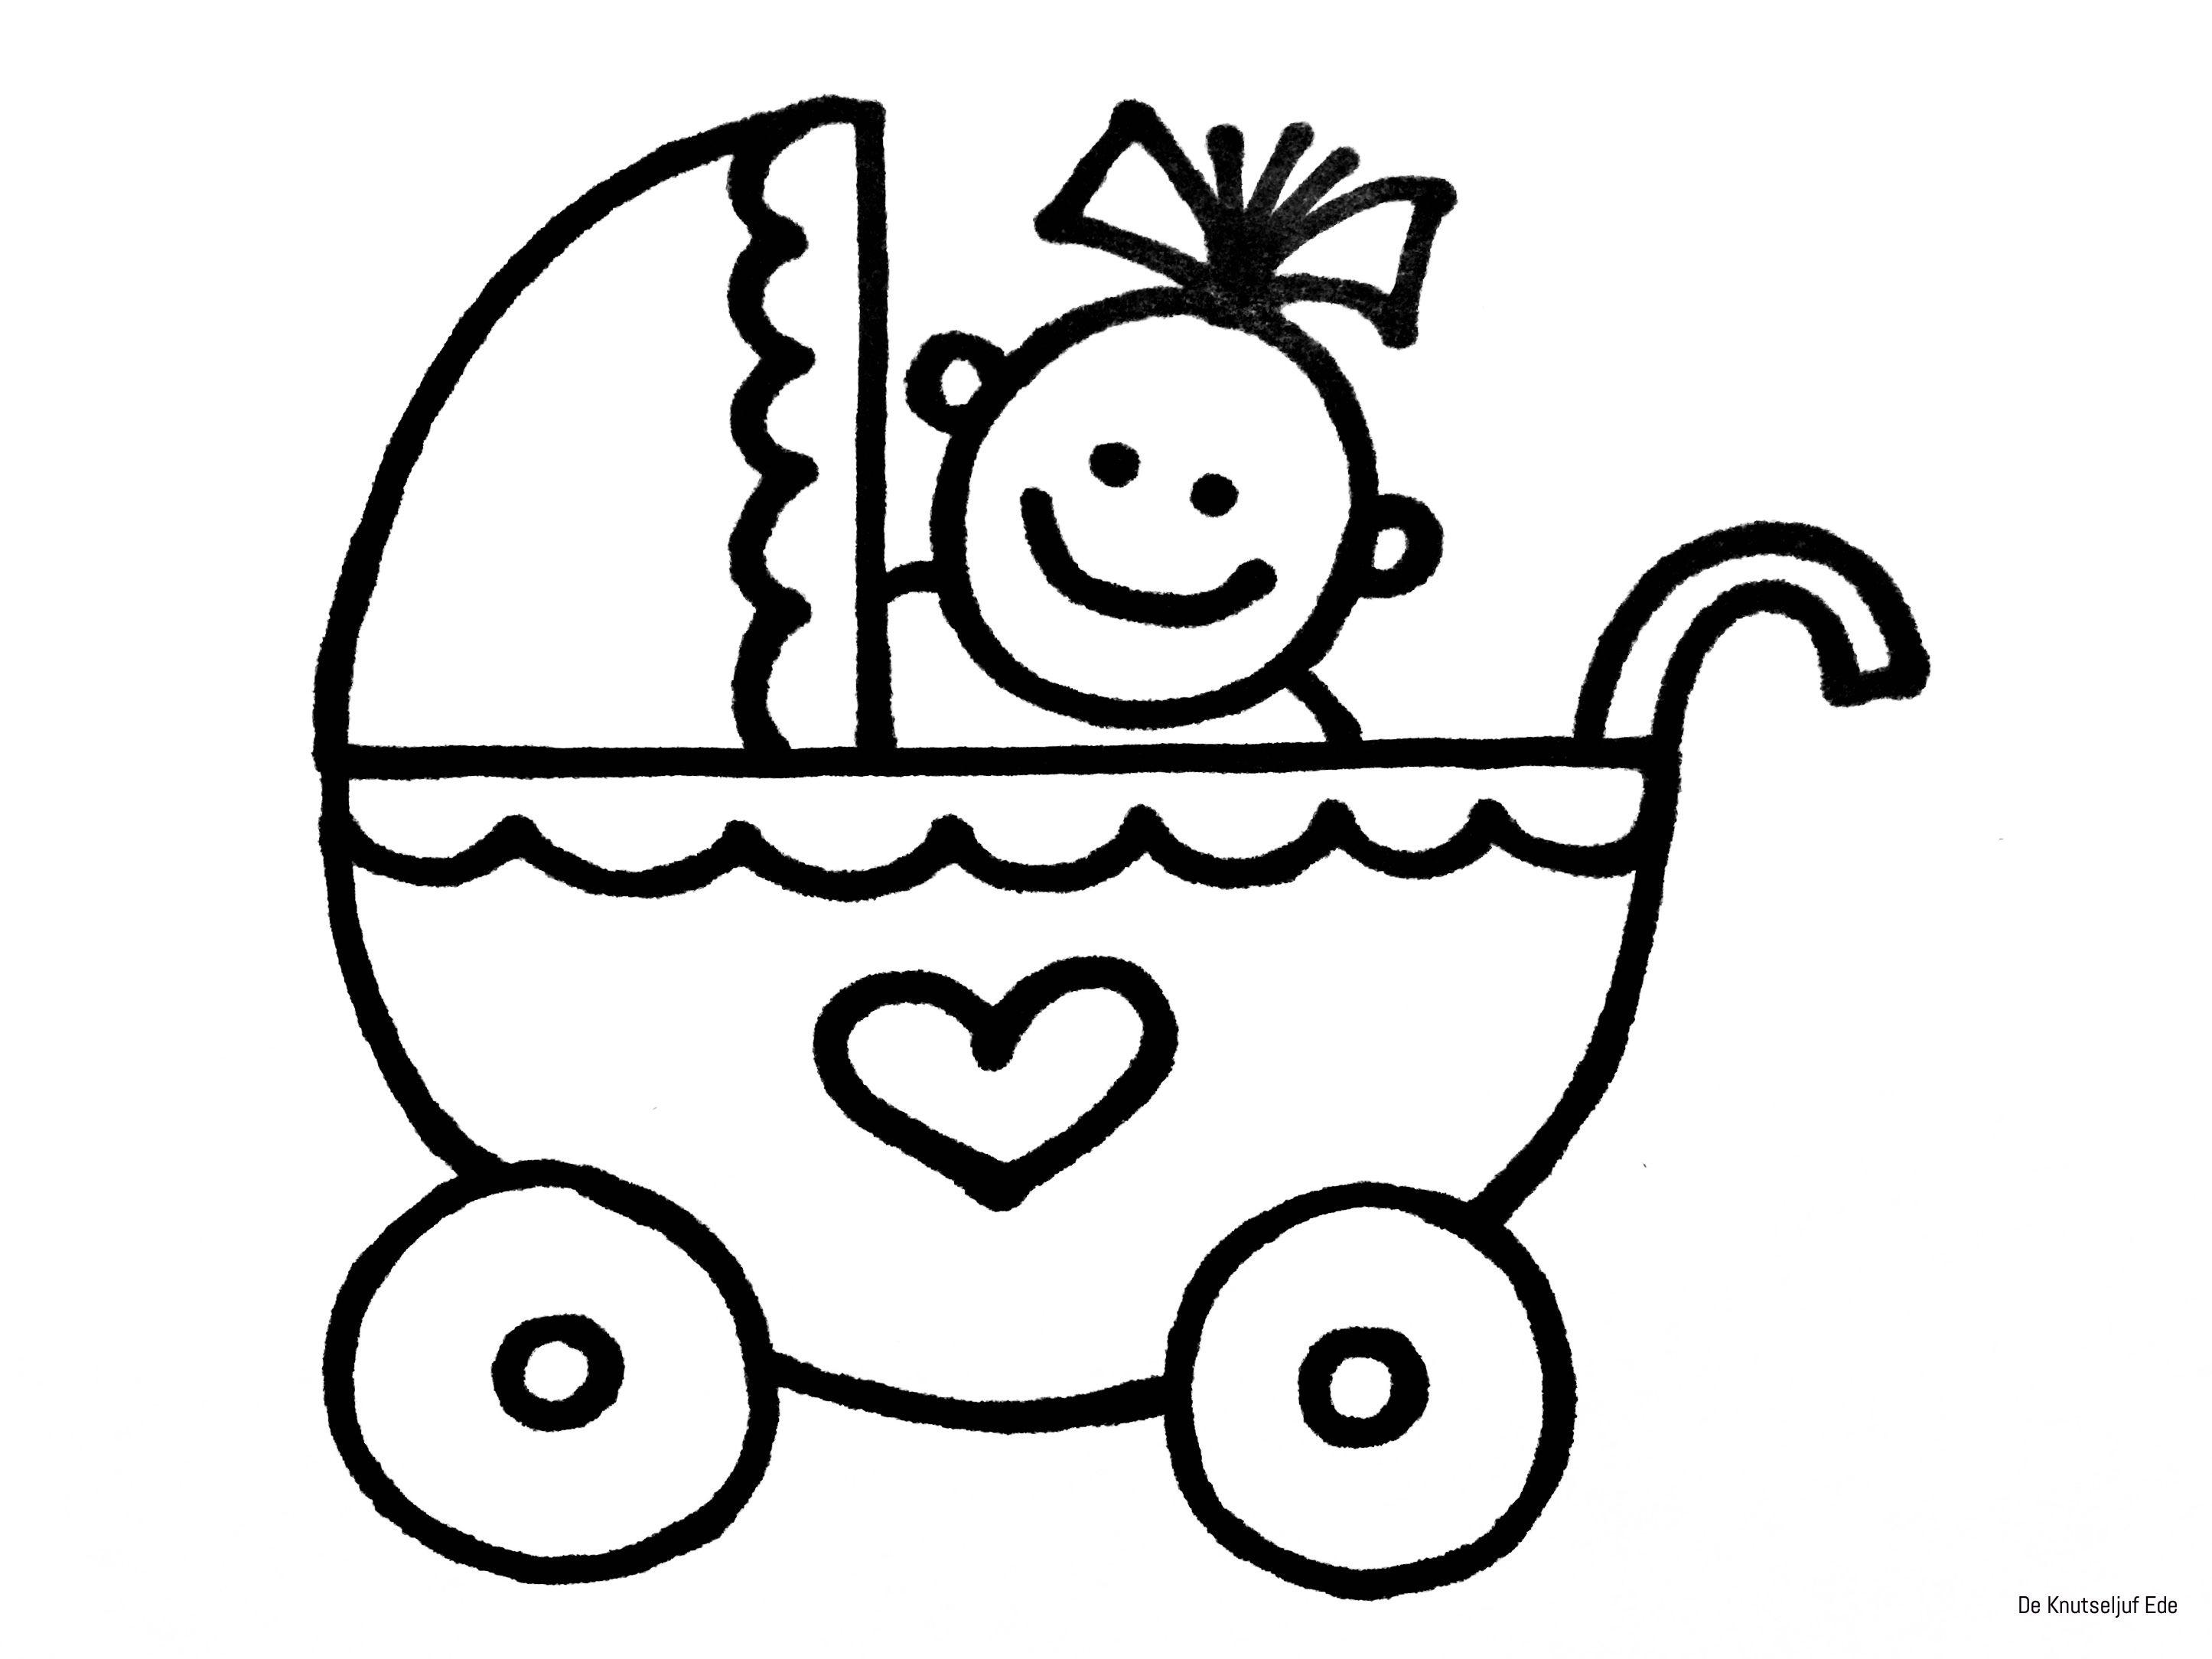 Baby Kleurplaten Geboorte Kraamcadeau Babyshower Kleurplaat Baby Geboren Baby Kleurplaa Knutselen Geboorte Knutselen Zwangerschapsverlof Baby Knutselen